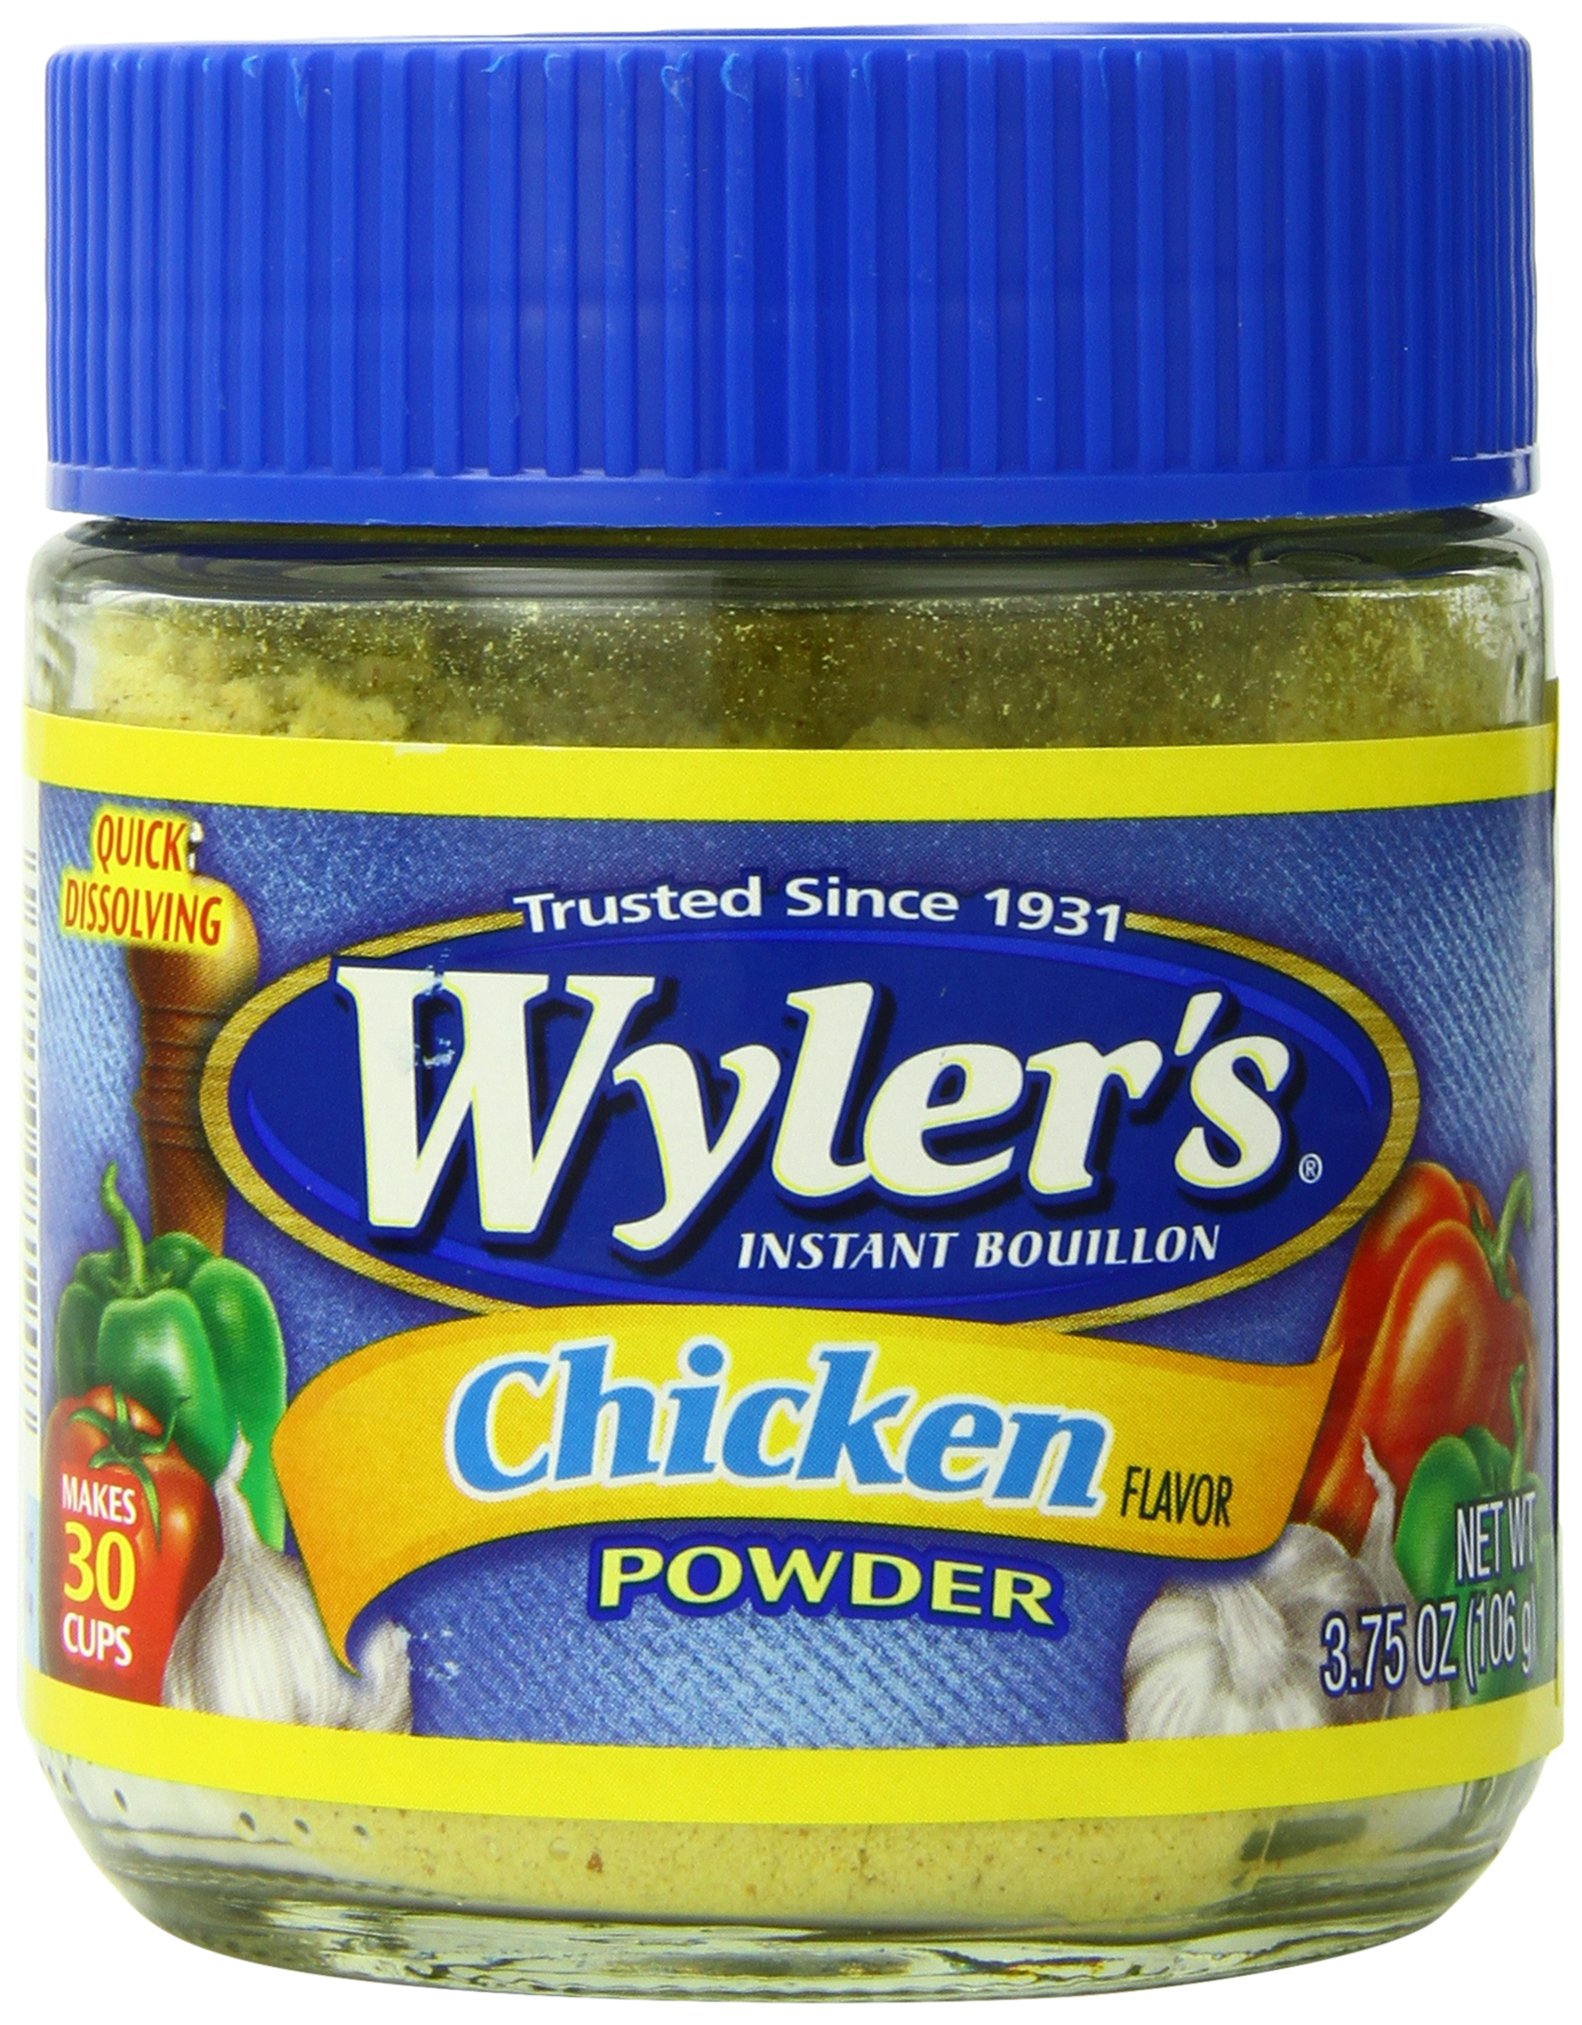 Chicken bouillon